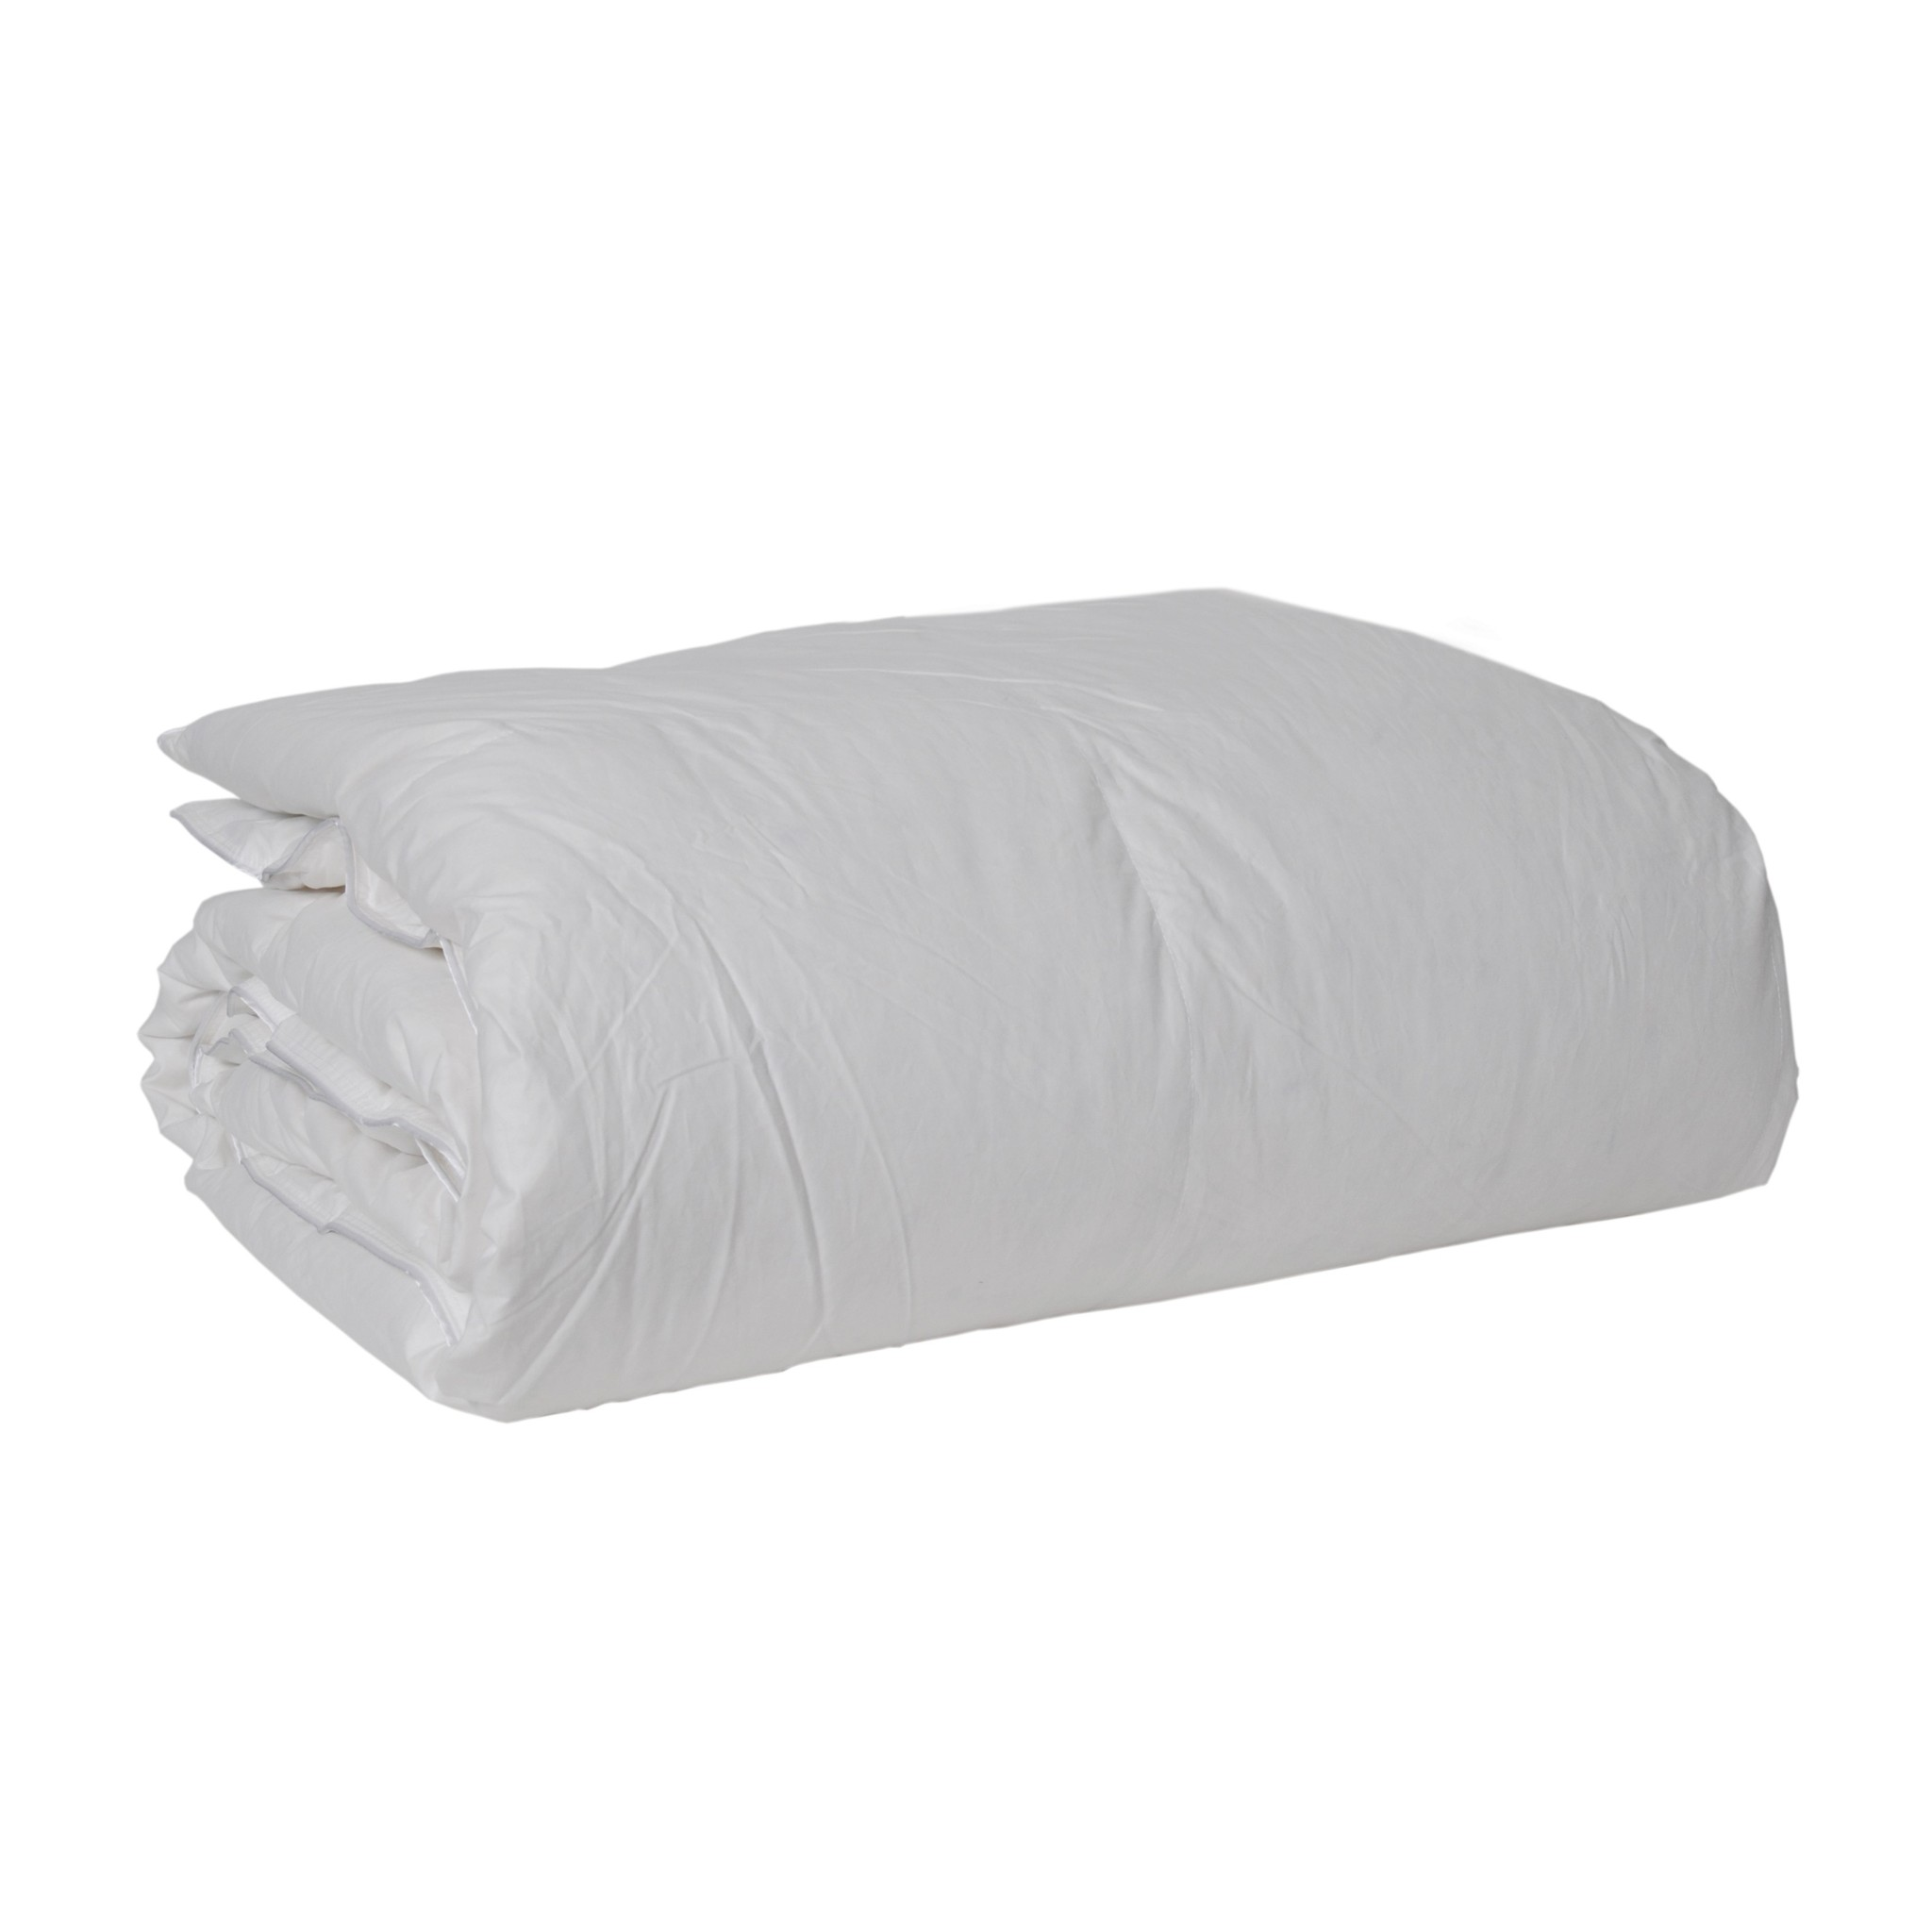 Элитное одеяло пуховое 195х215 Therapy Quilt от Casual Avenue